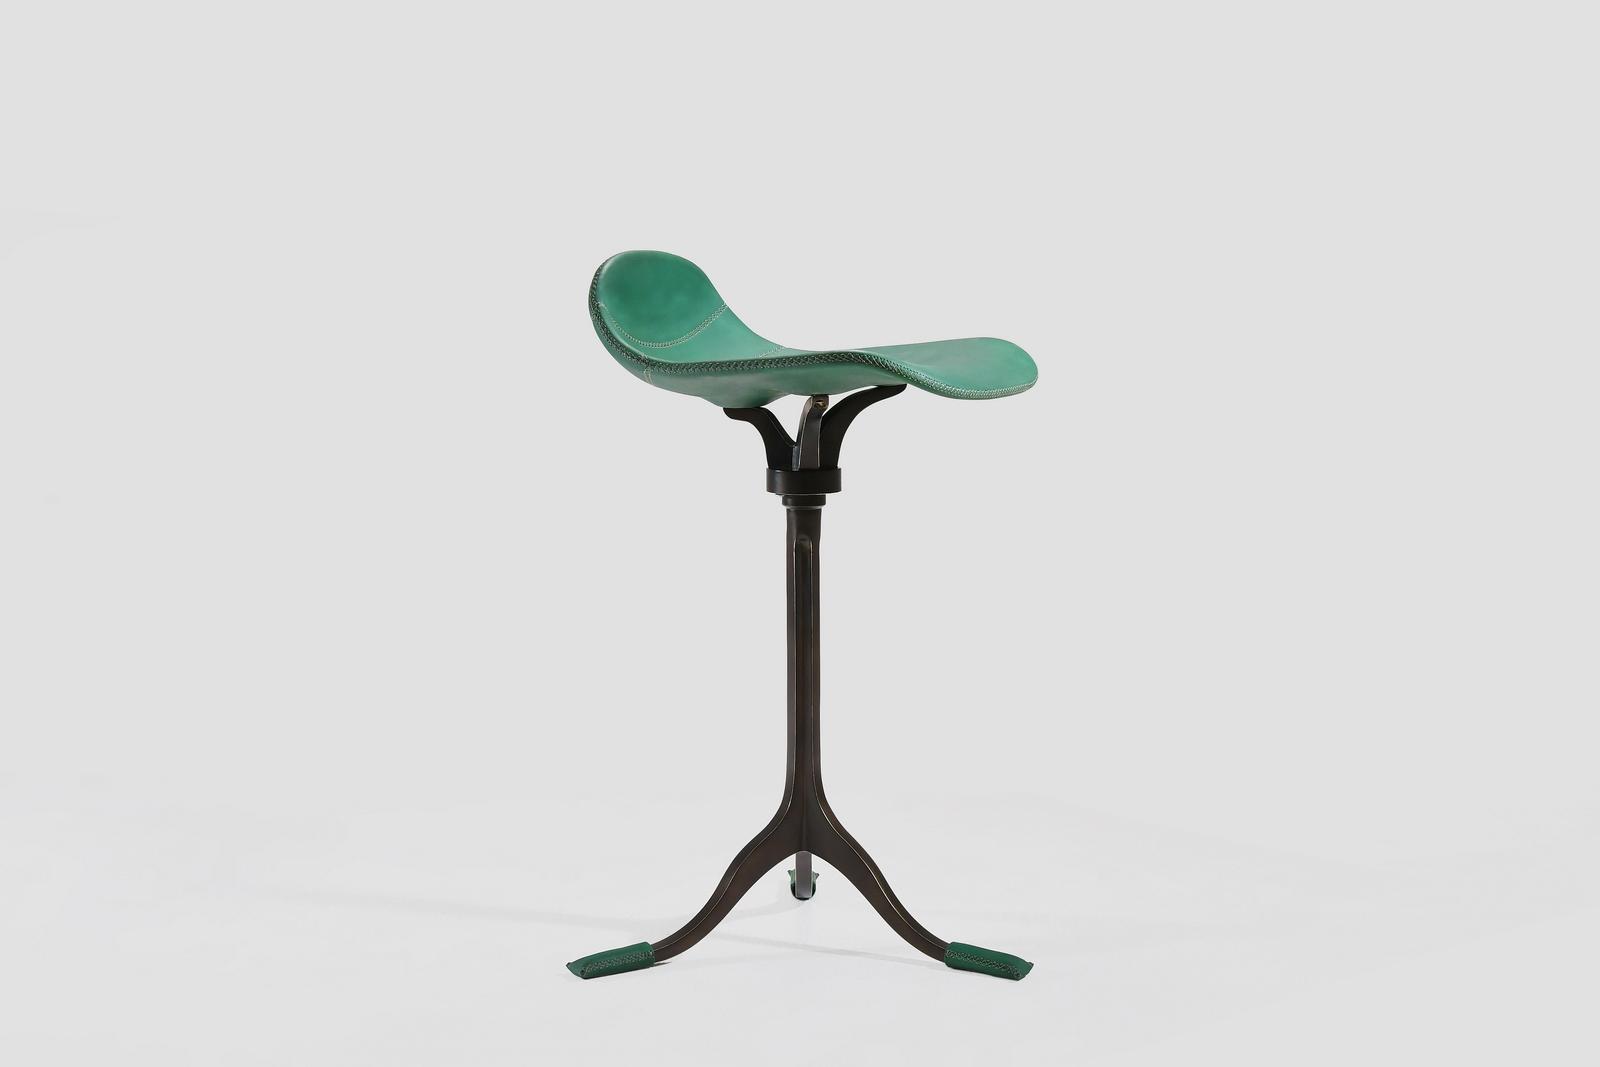 PTendercool-Chair-PT48-BS3-GR-07